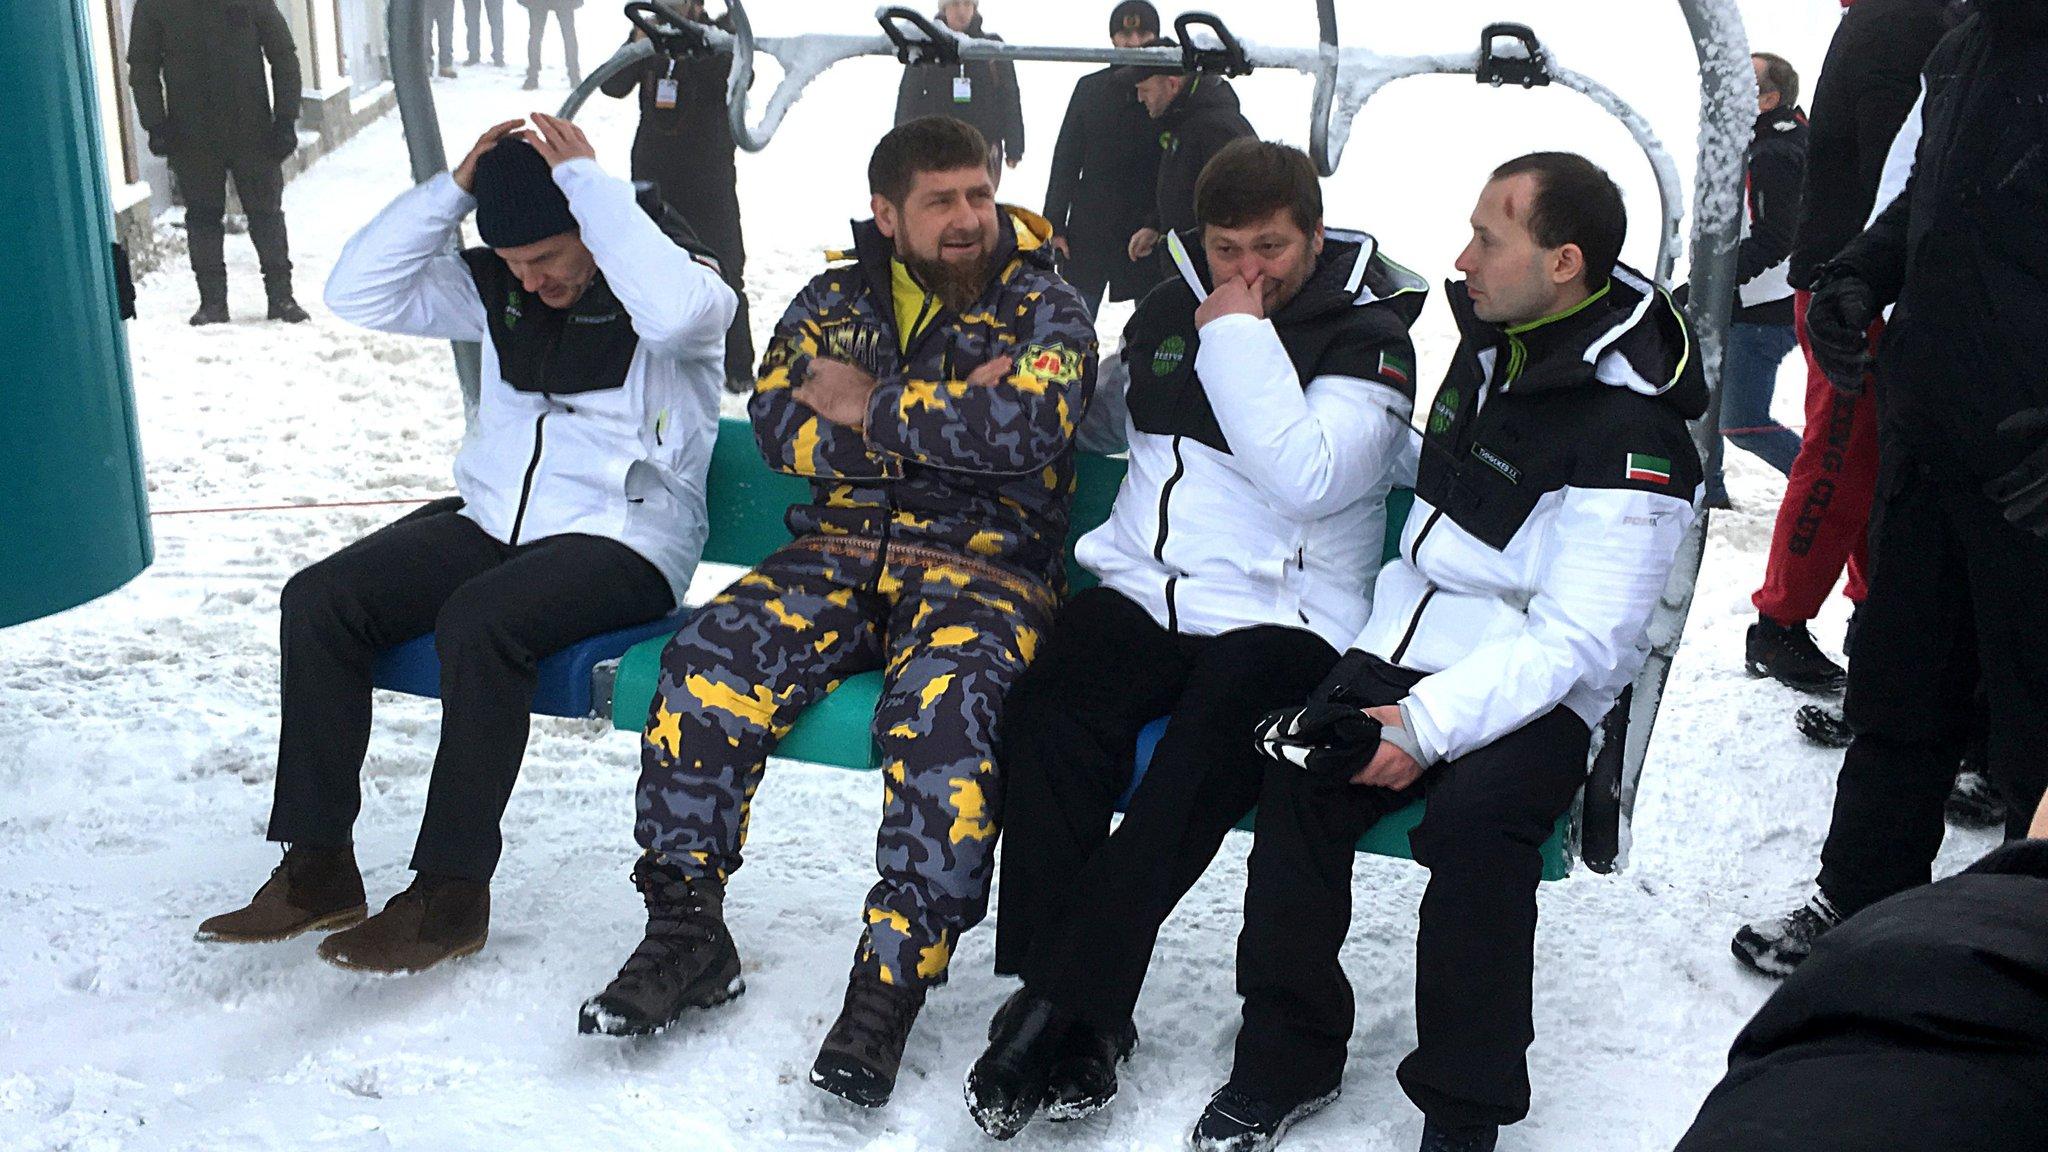 Chechnya woos tourists with glitzy new ski resort